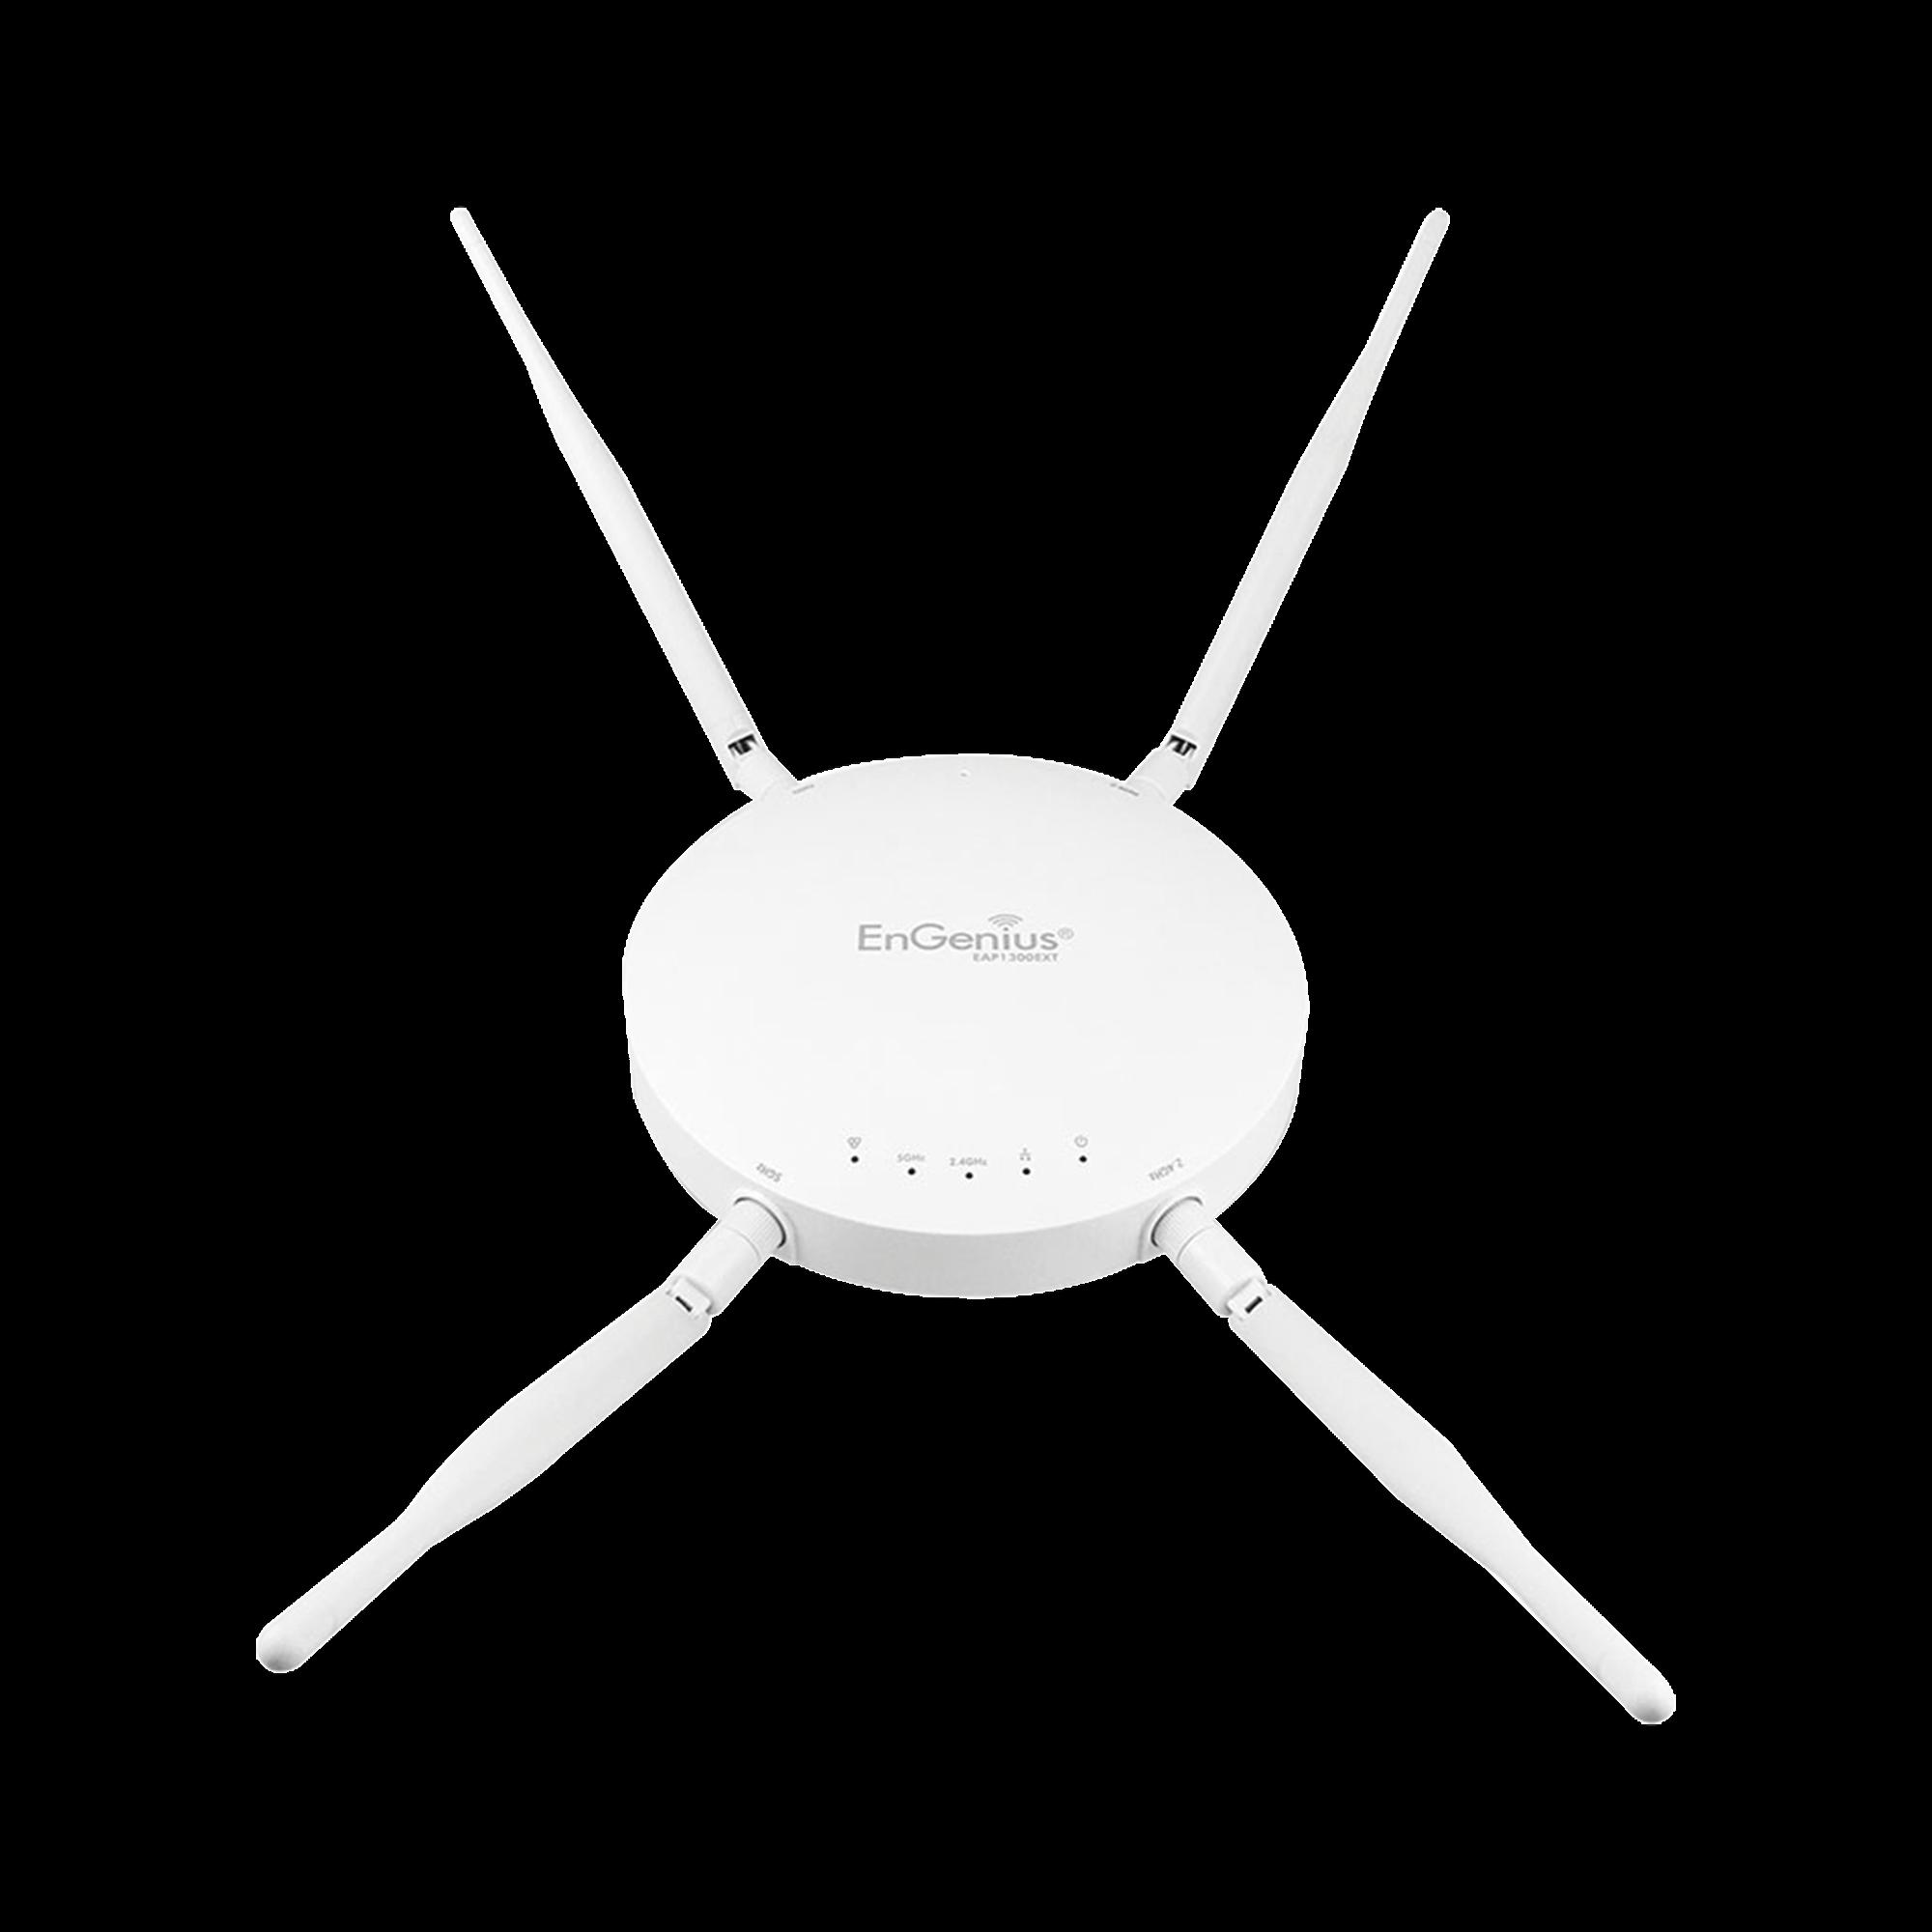 Punto de Acceso WiFi MU-MIMO 2x2 para Interior, Doble Banda en 5 y 2 GHz, Hasta 1267 Mbps, 250+ Usuarios Simultaneos, Antenas de Alta Ganancia Removibles